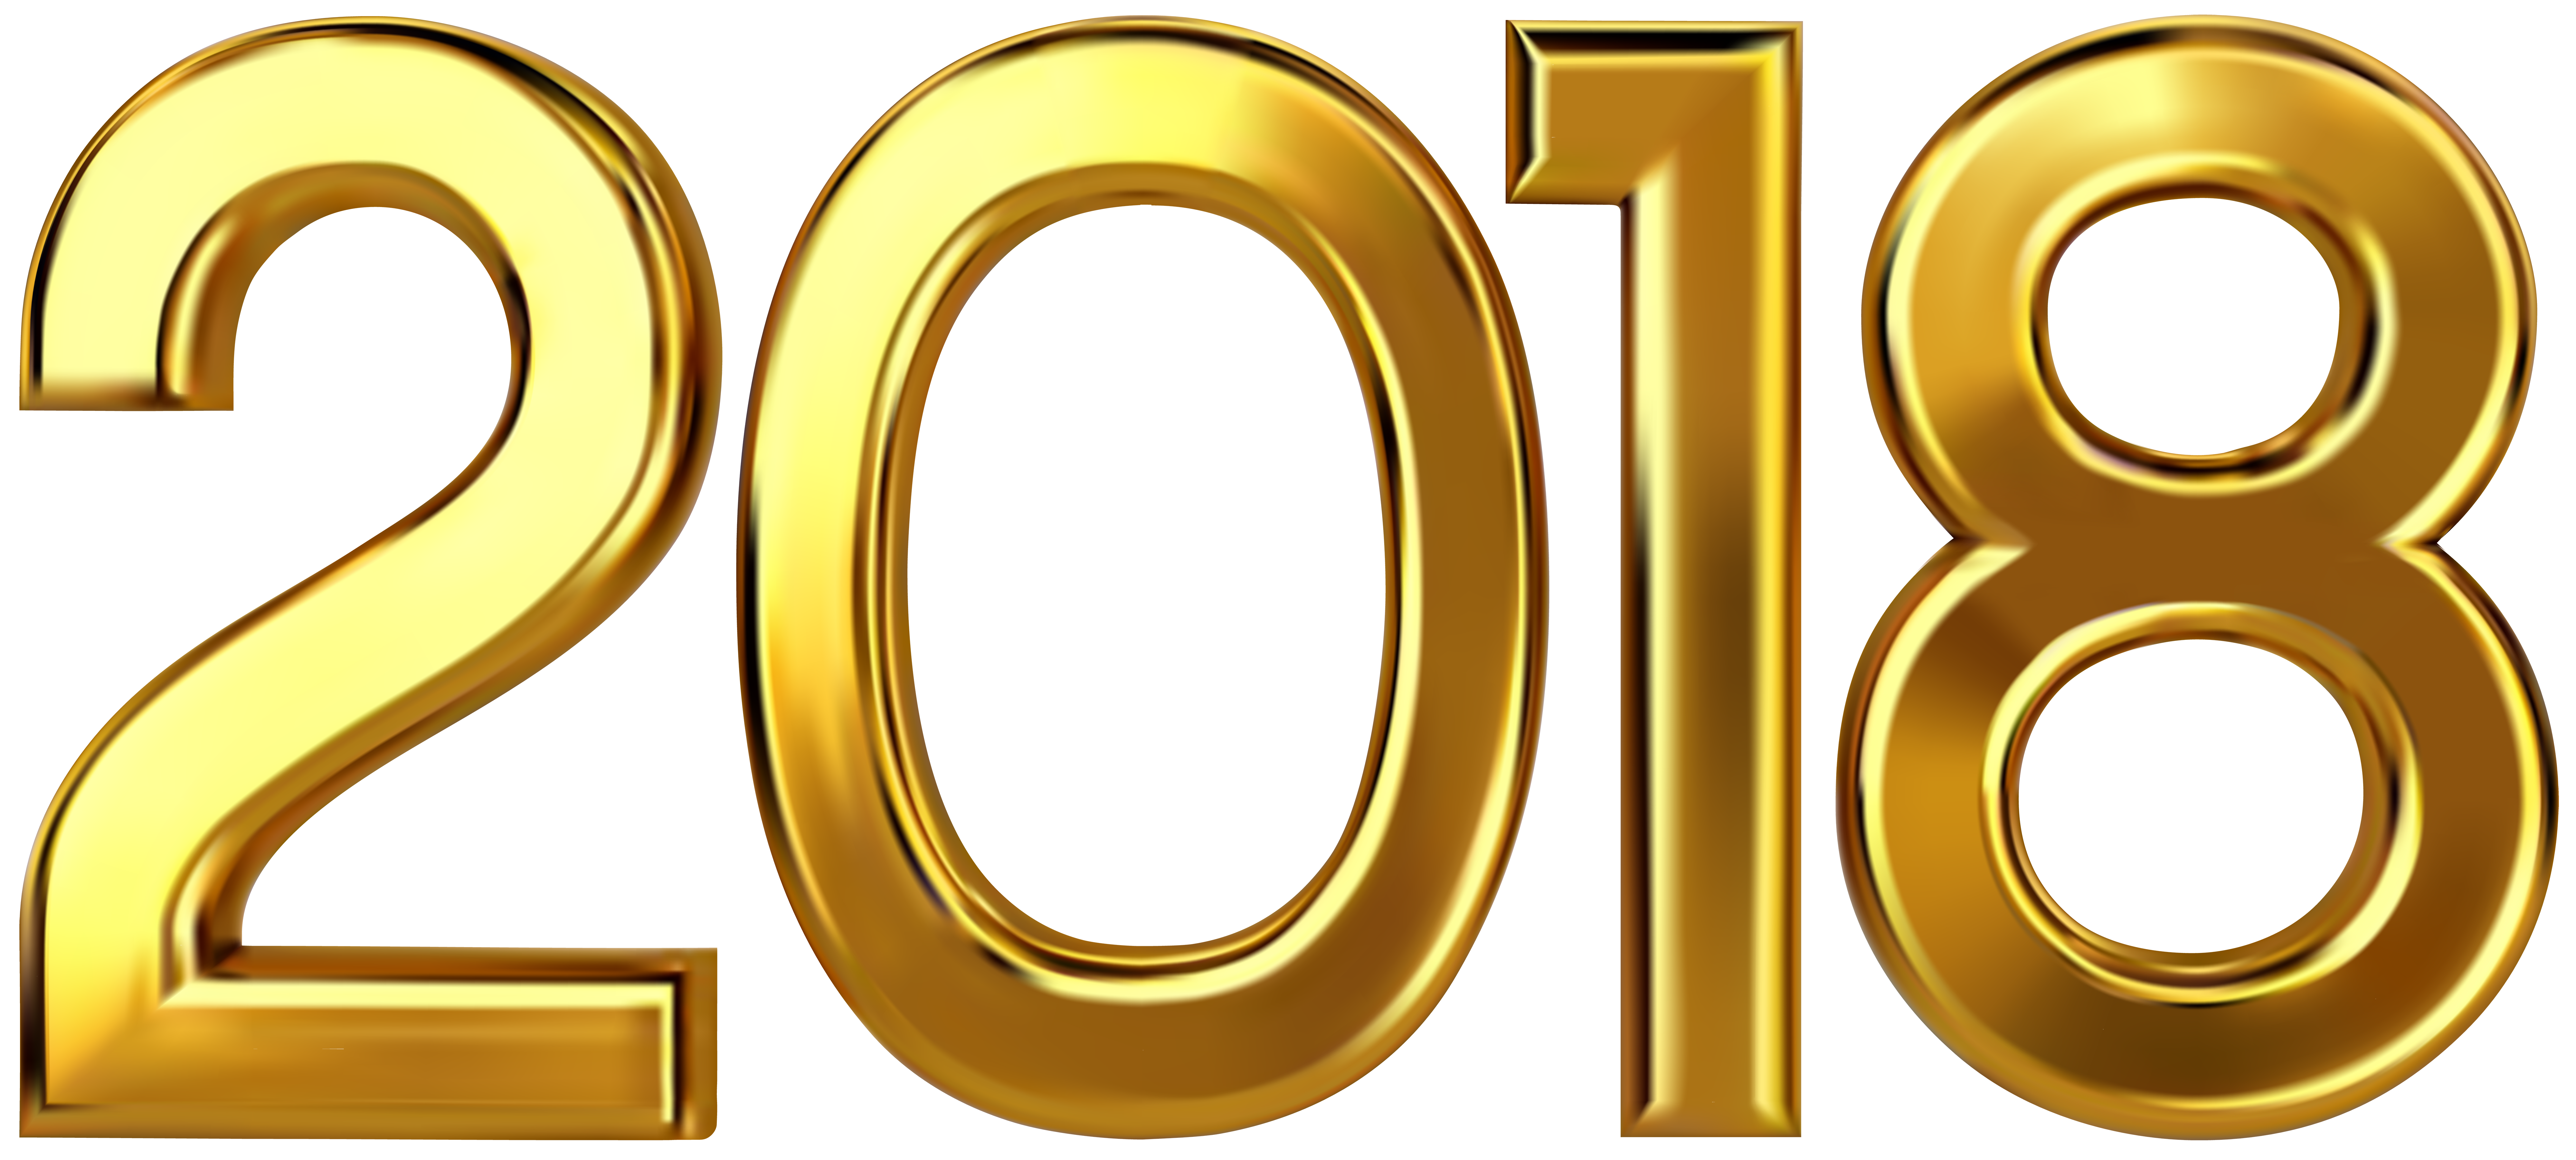 2018 clipart.  gold clip art